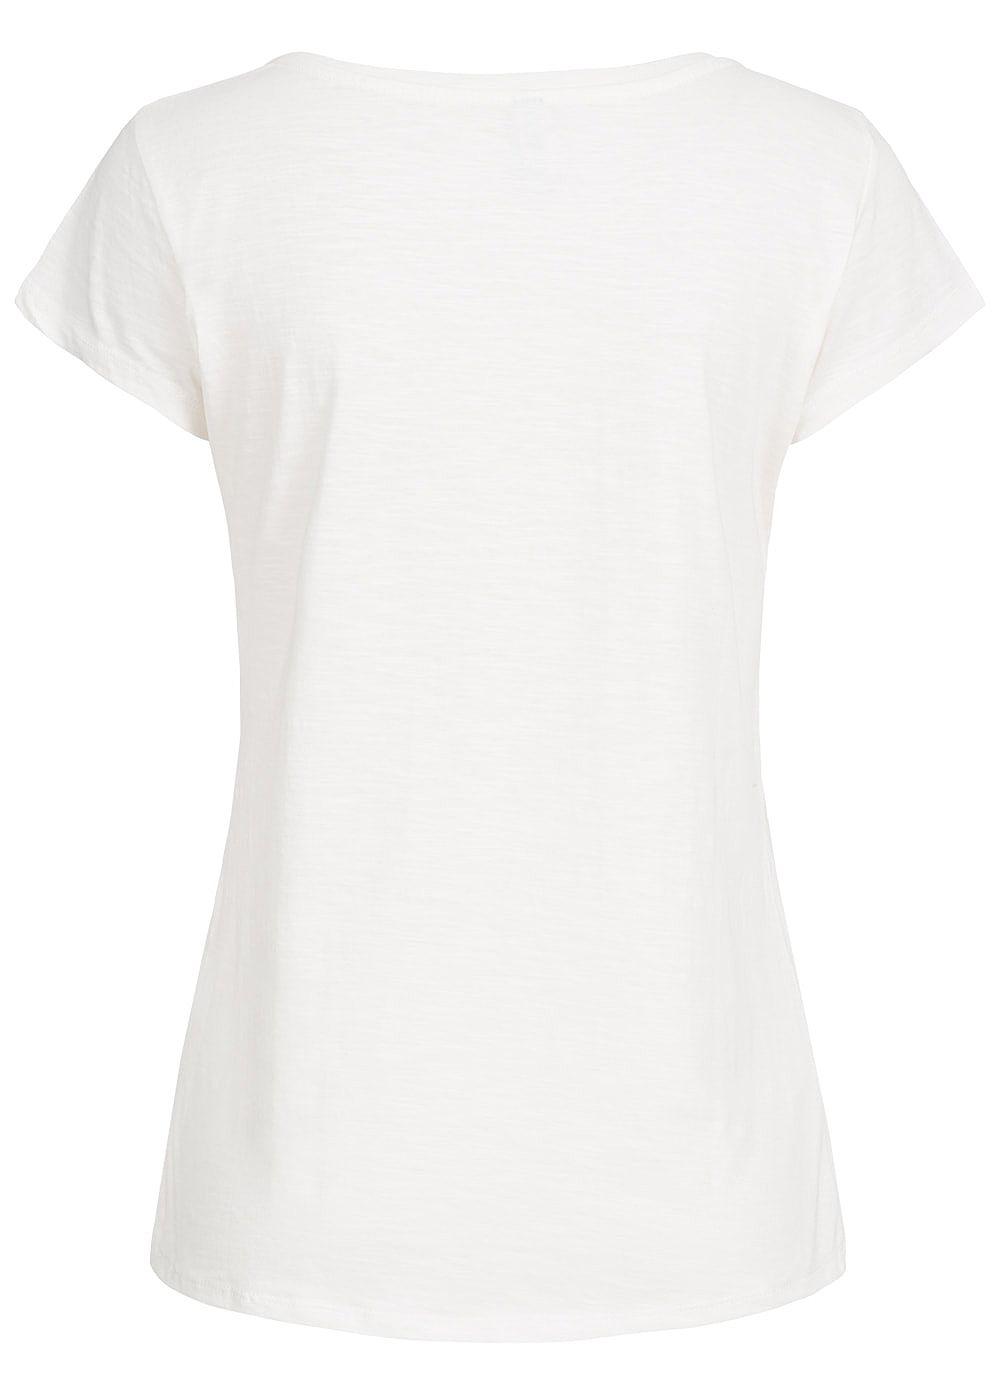 Hailys damen t shirt flaminigo print mit pailletten off for T shirt printing one off